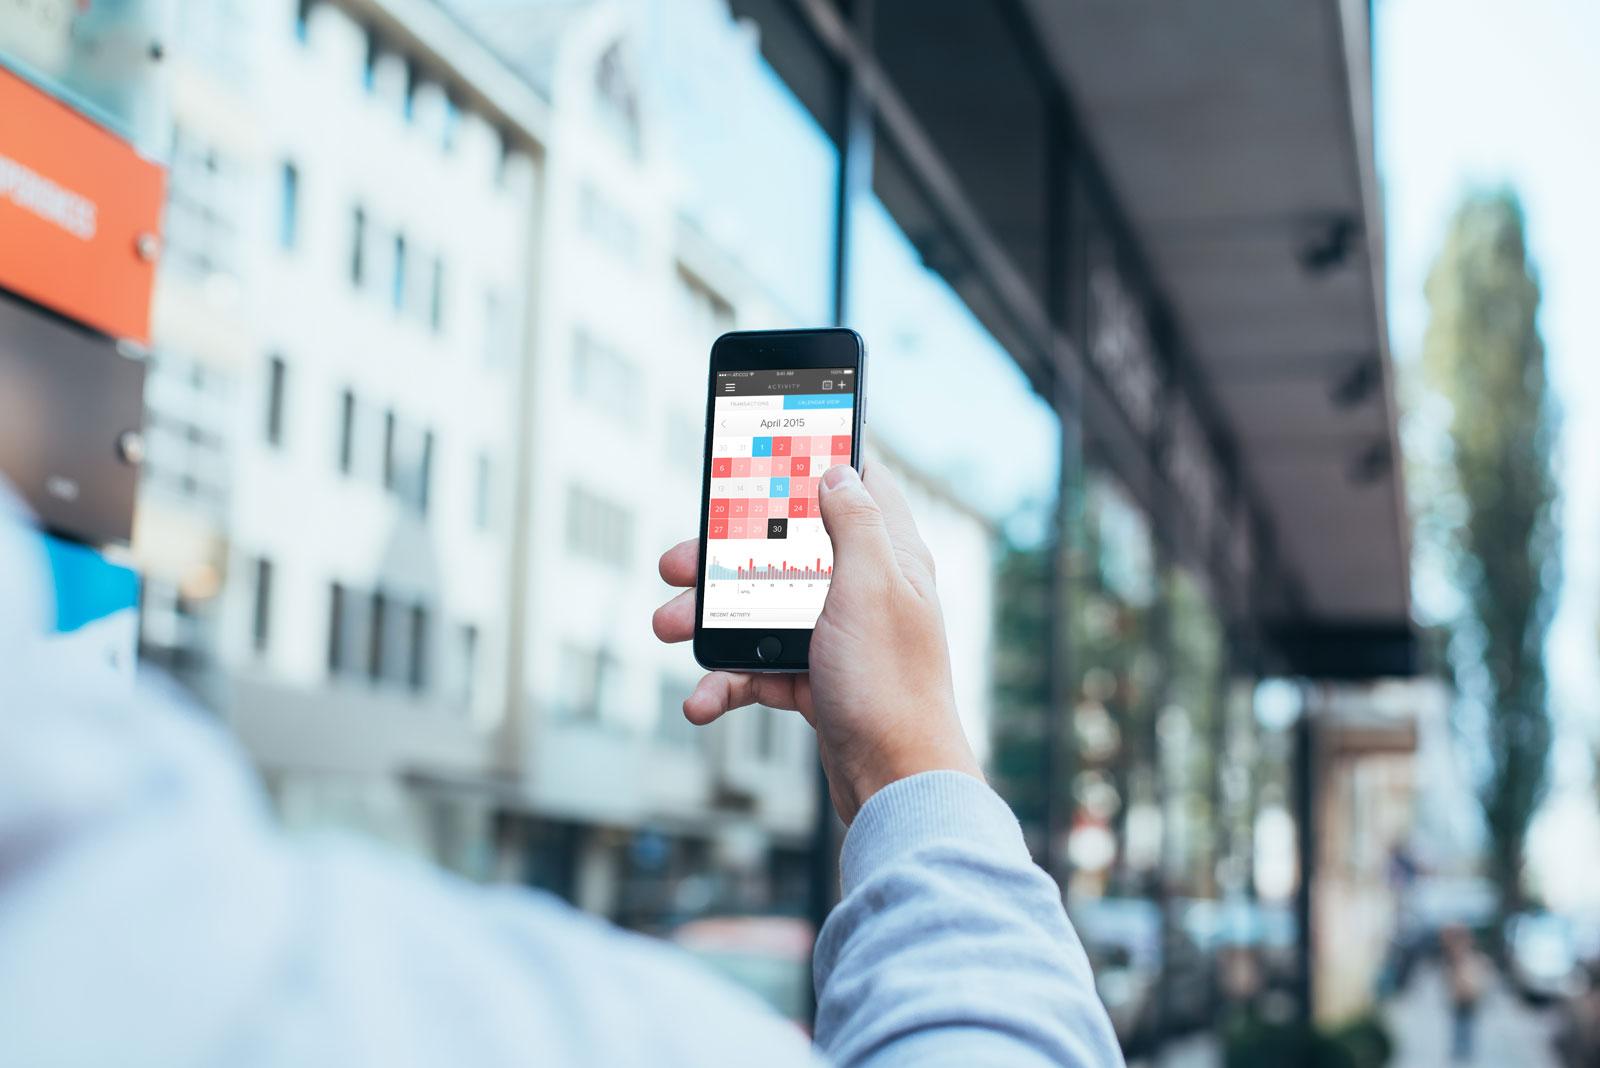 iphone6-street-calendar.jpg